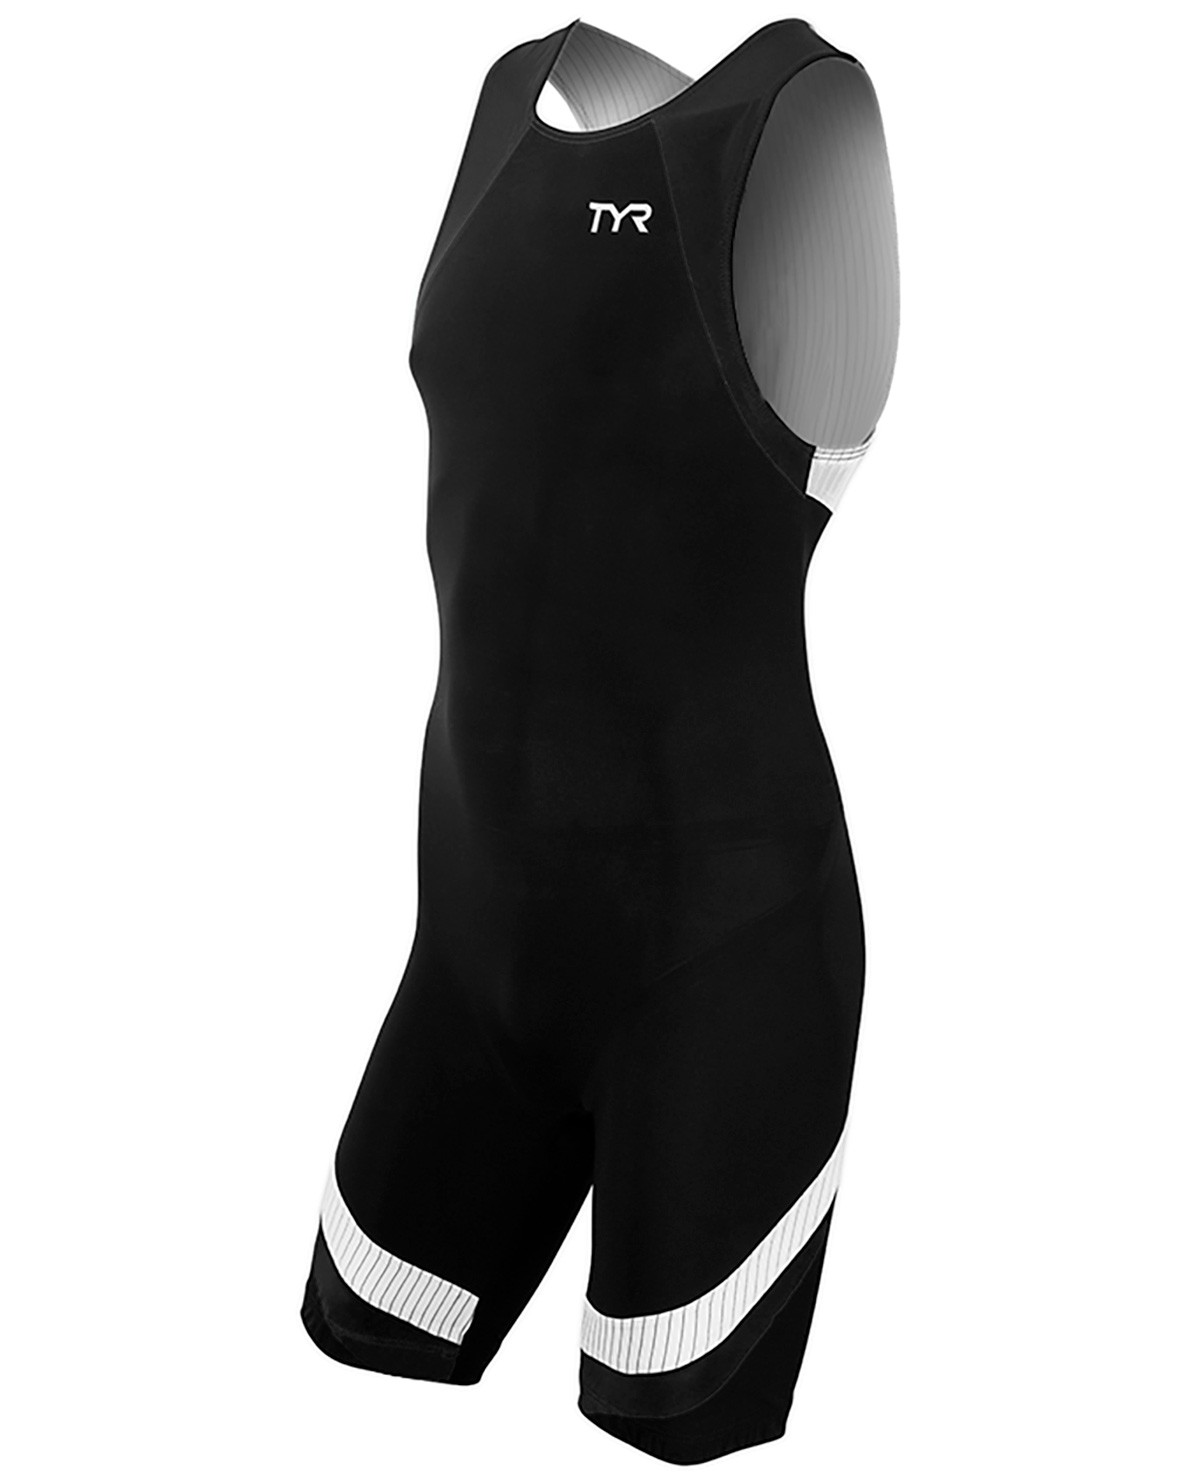 93328f7f4b ... Triathlon Gifts For Him: Men's Carbon Zipper Back Short John Triathlon  Suit ...